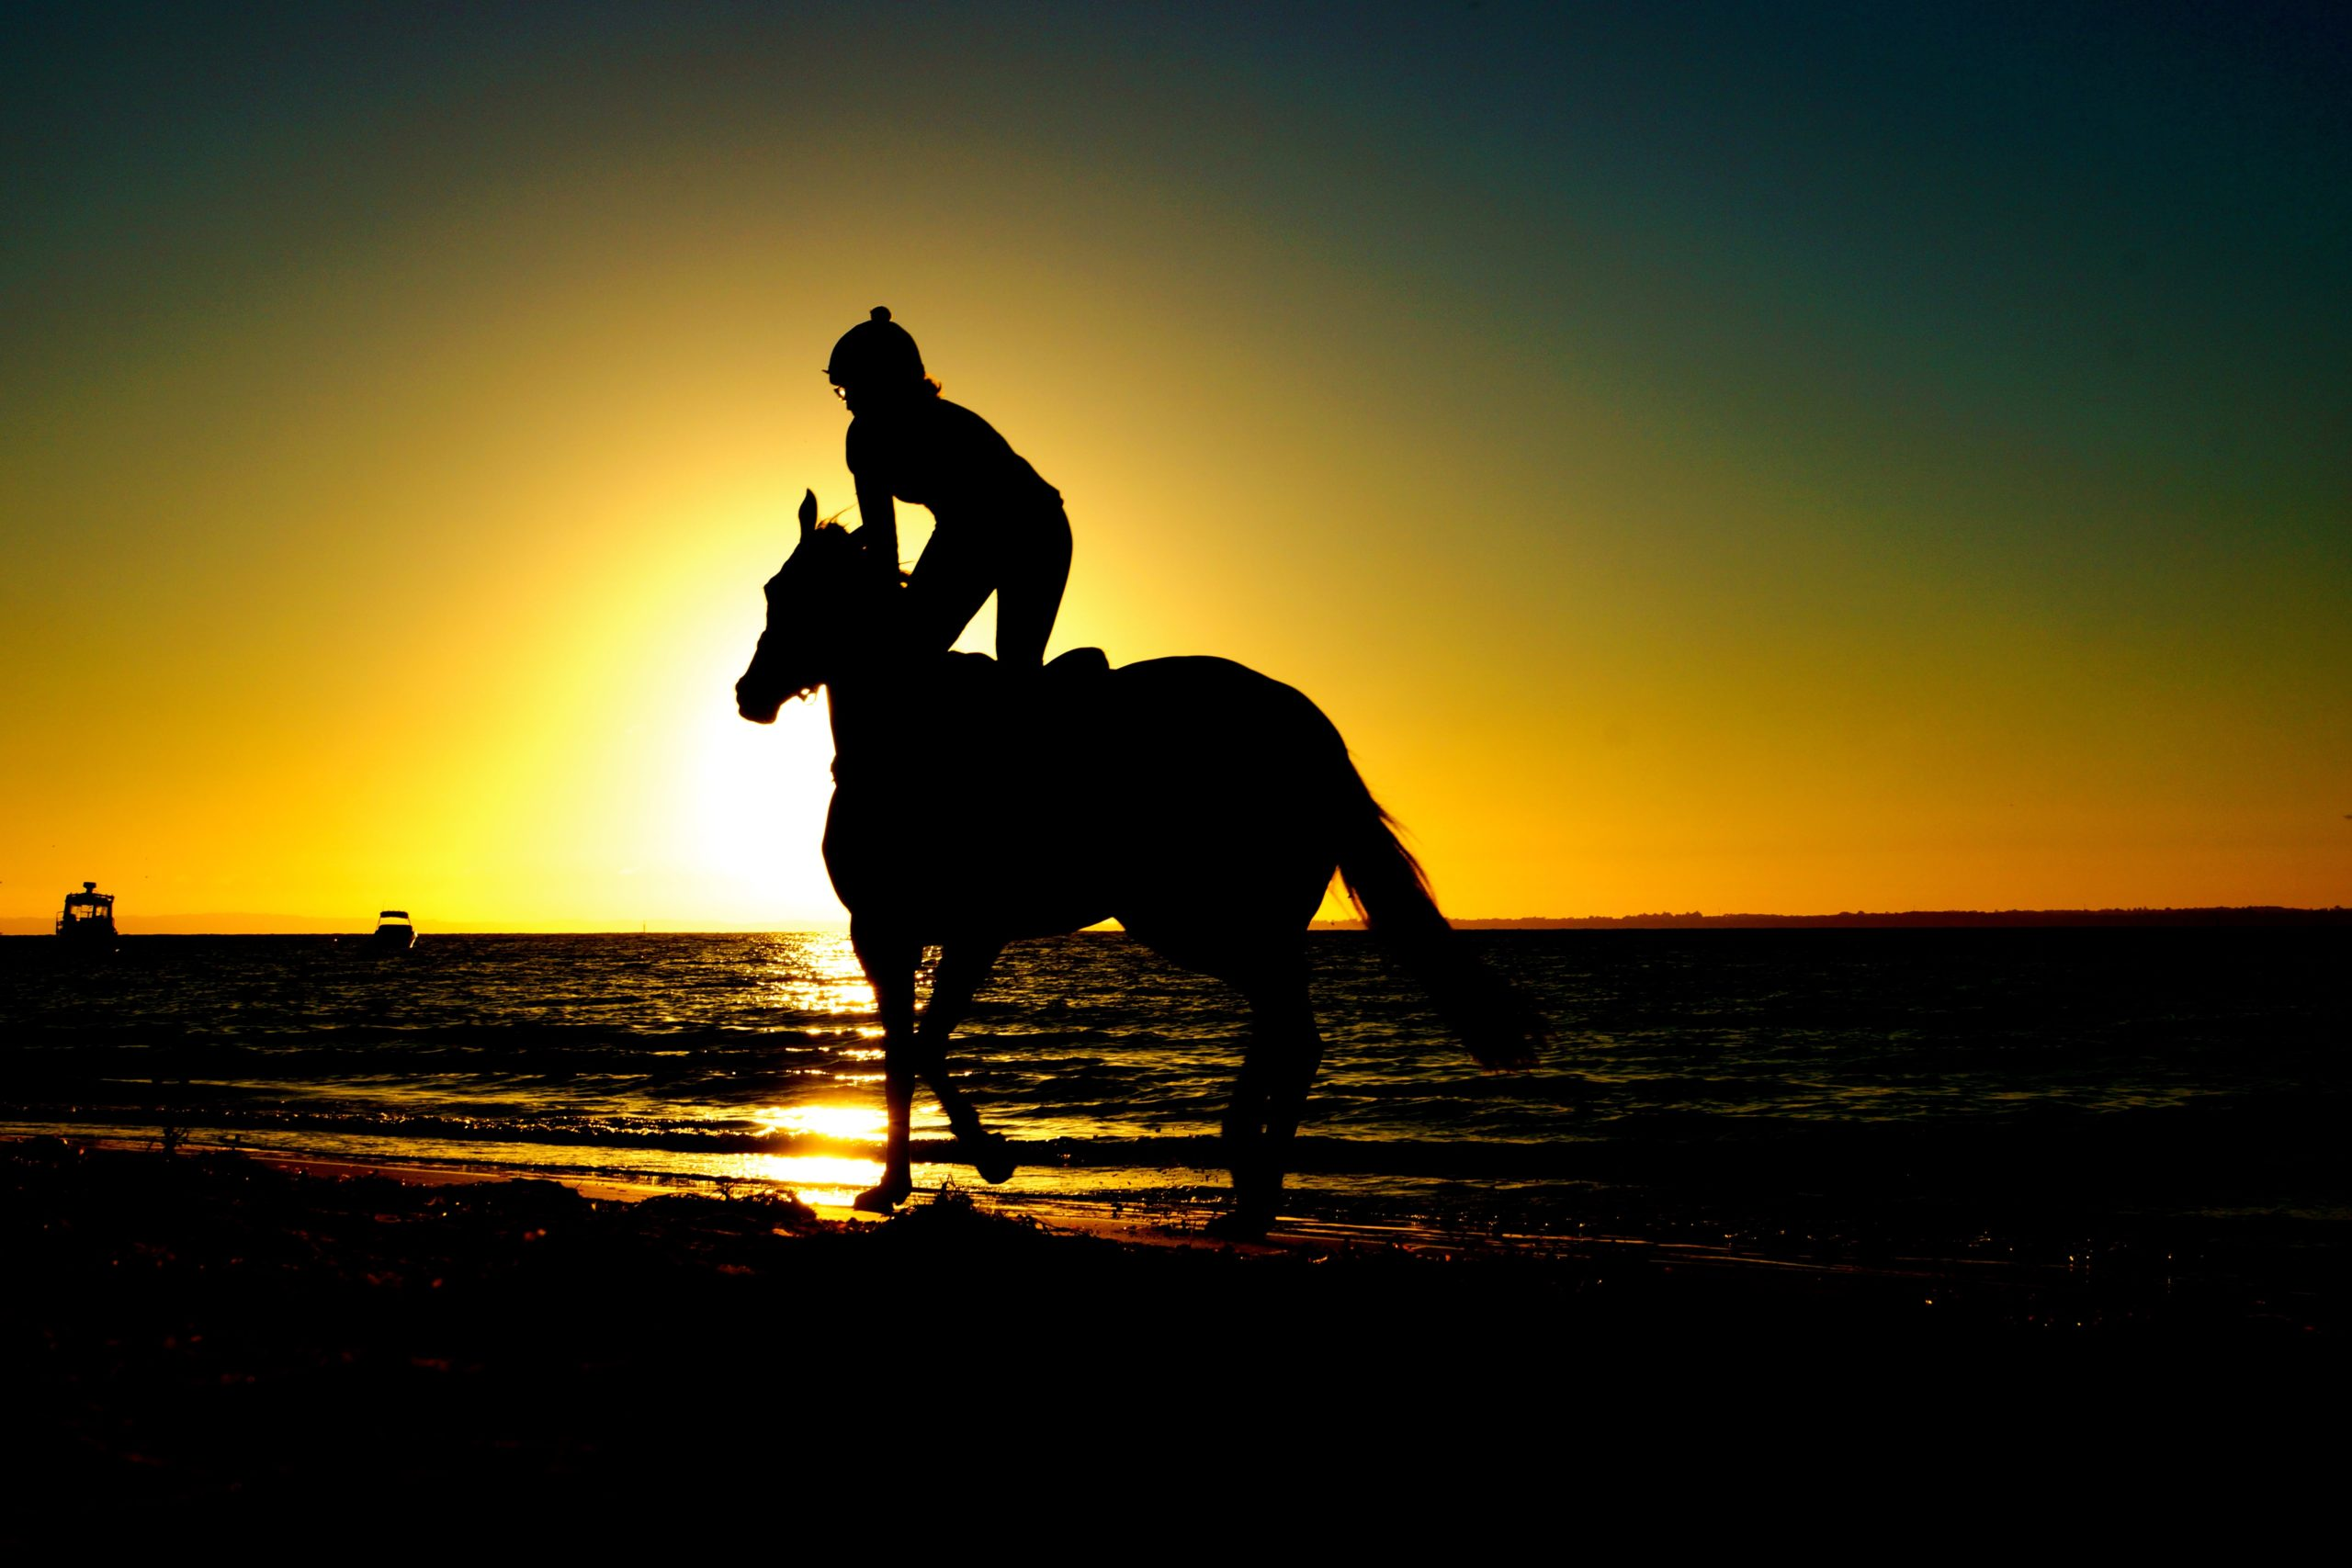 horseback rider silhouette riding on beach at sunset